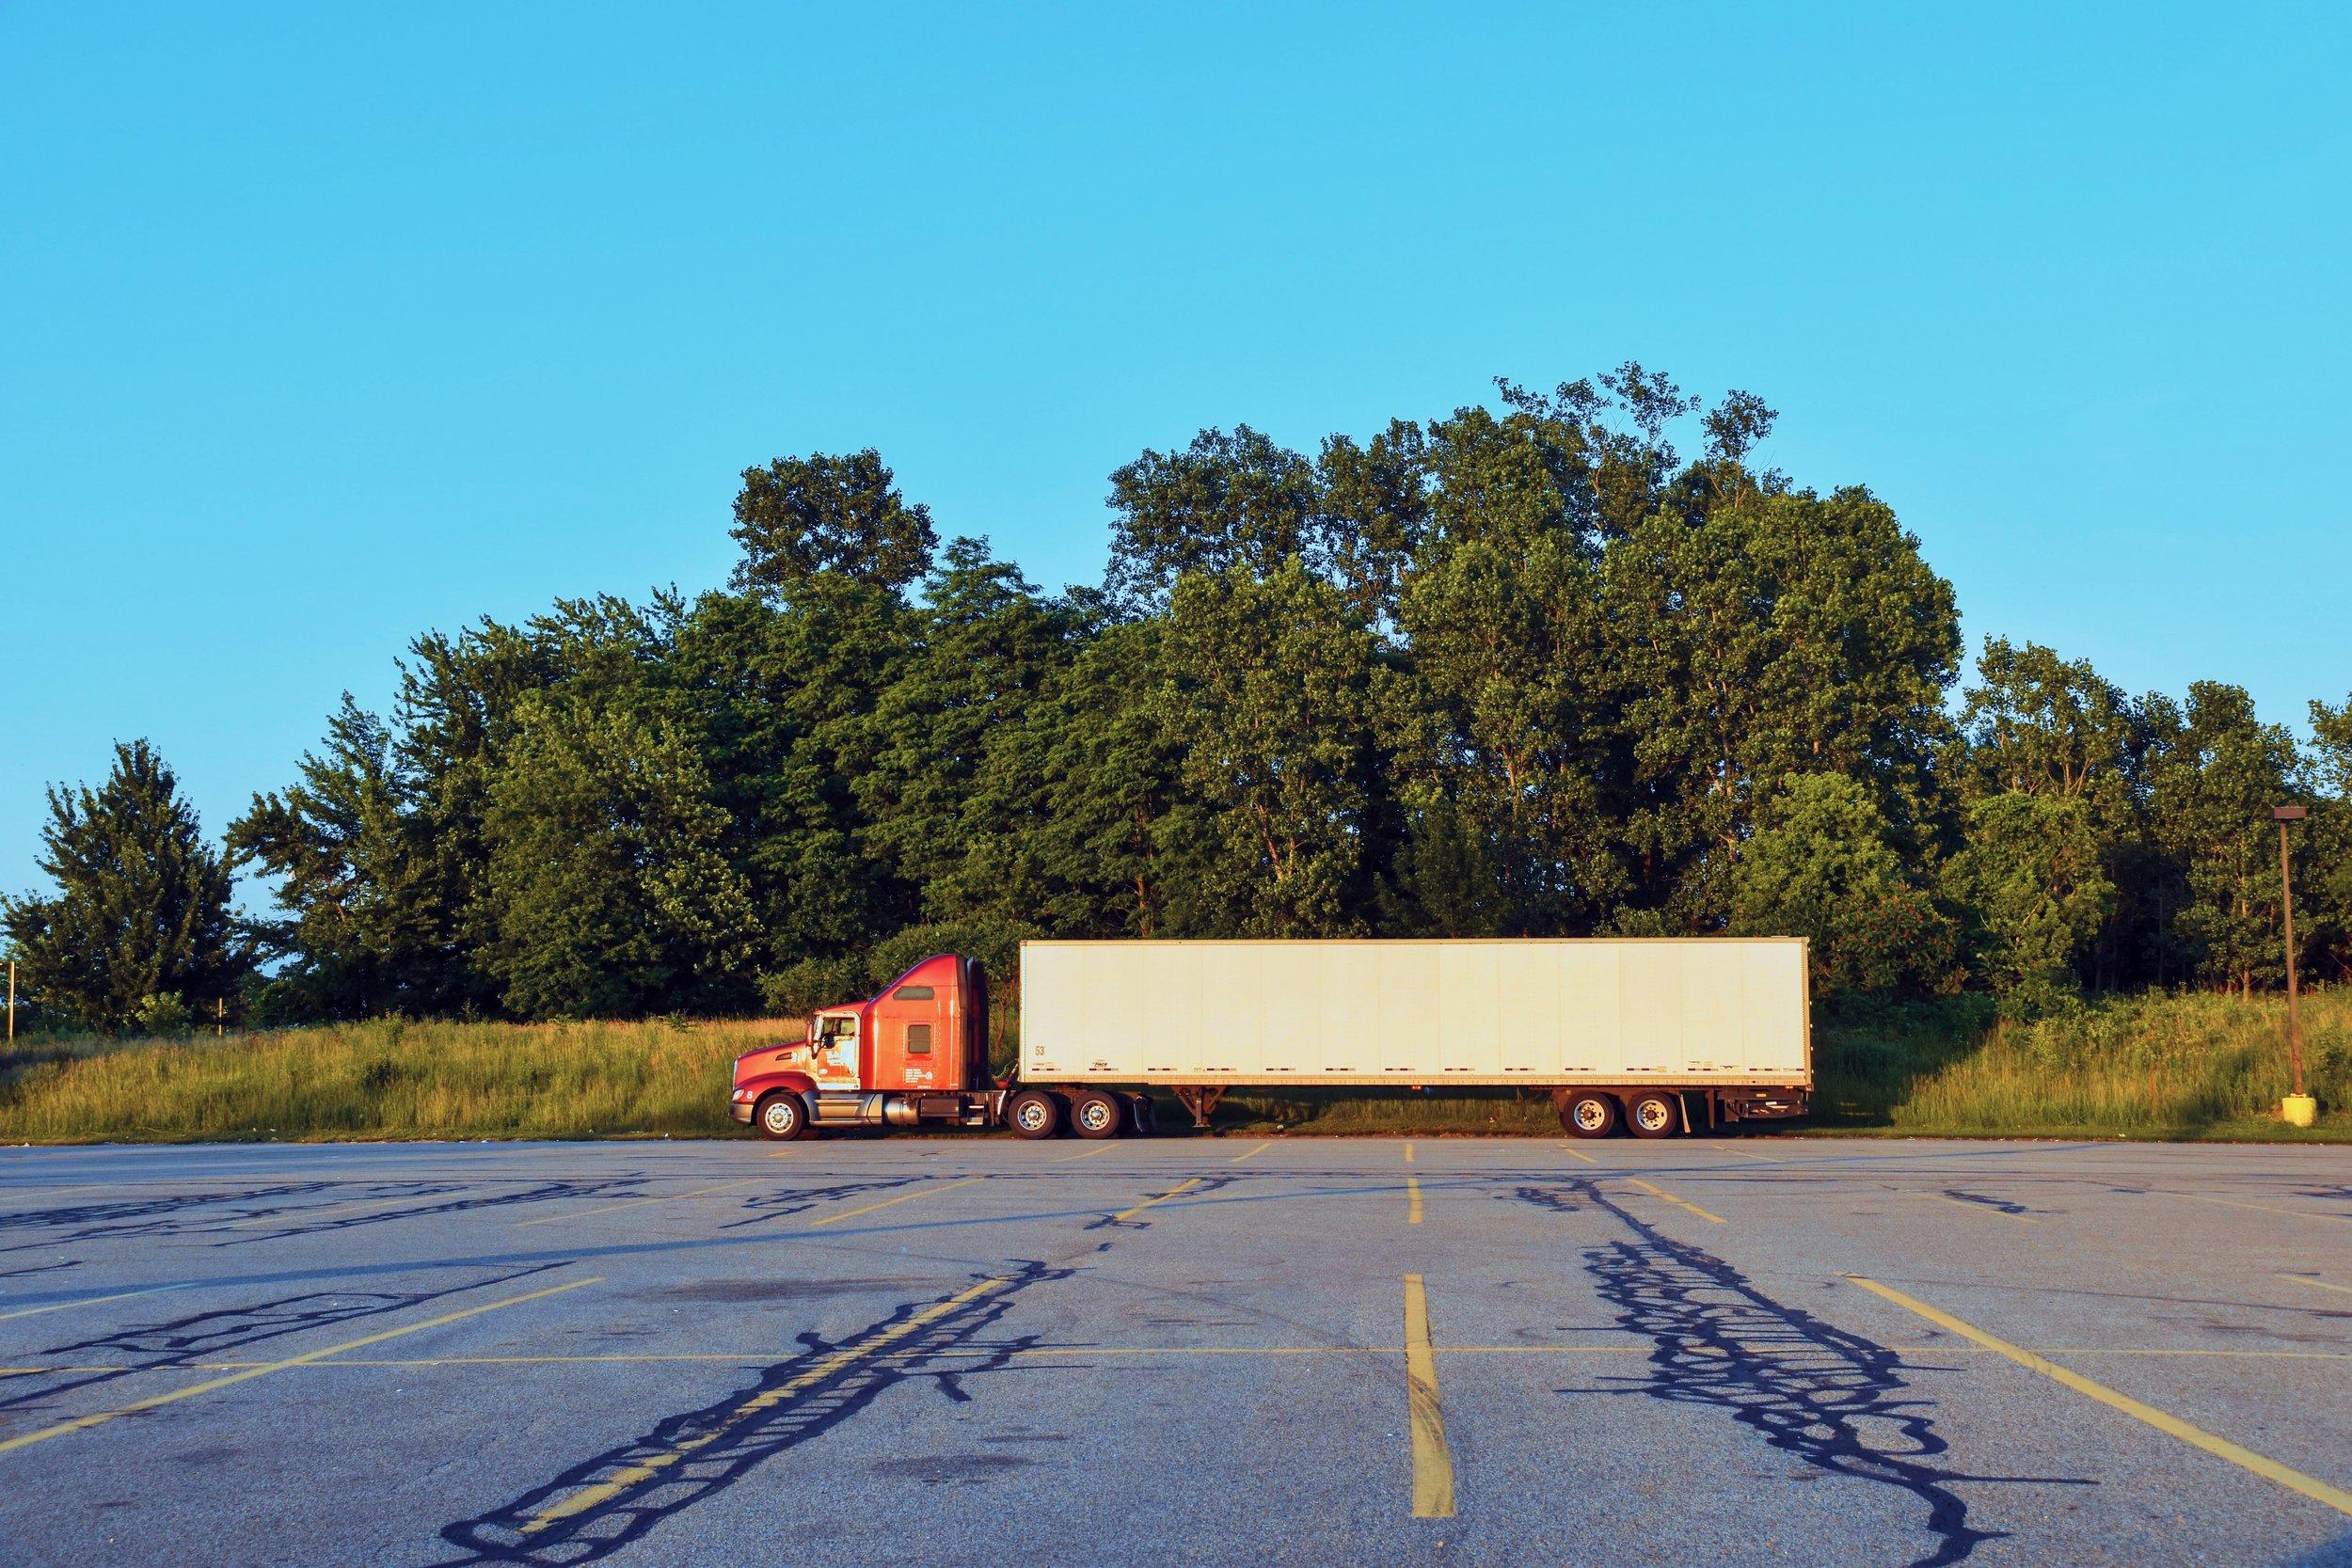 Picture of a semi-truck.